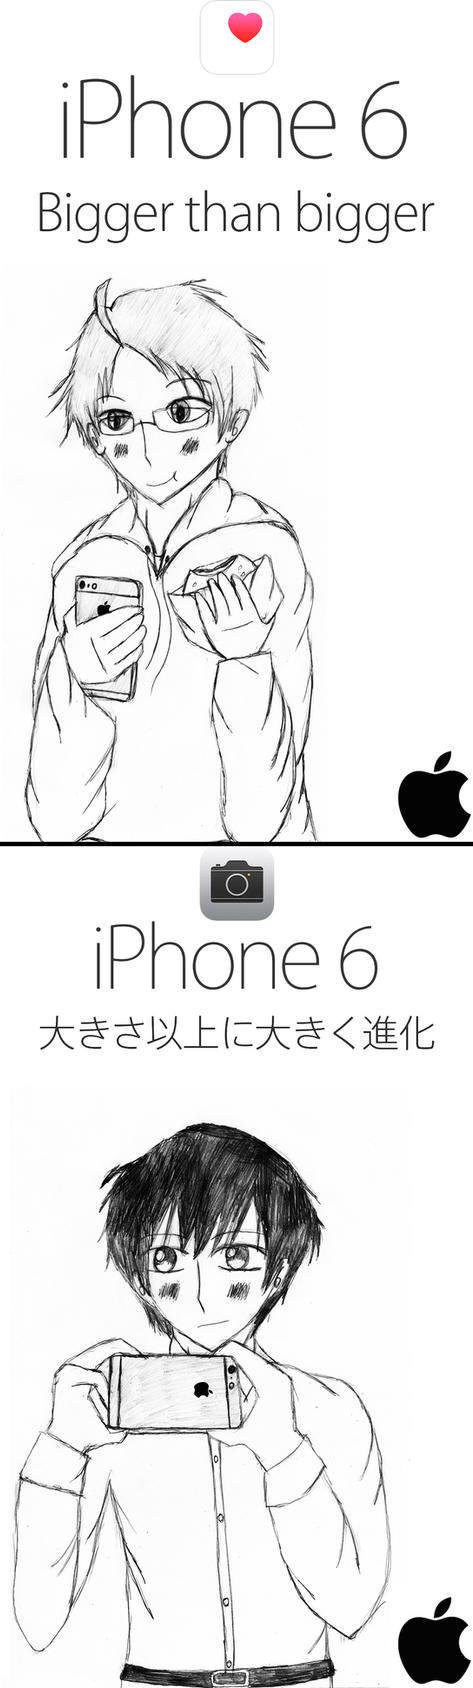 APH x Apple: iPhone 6 Posters by hiroyukibenjamin